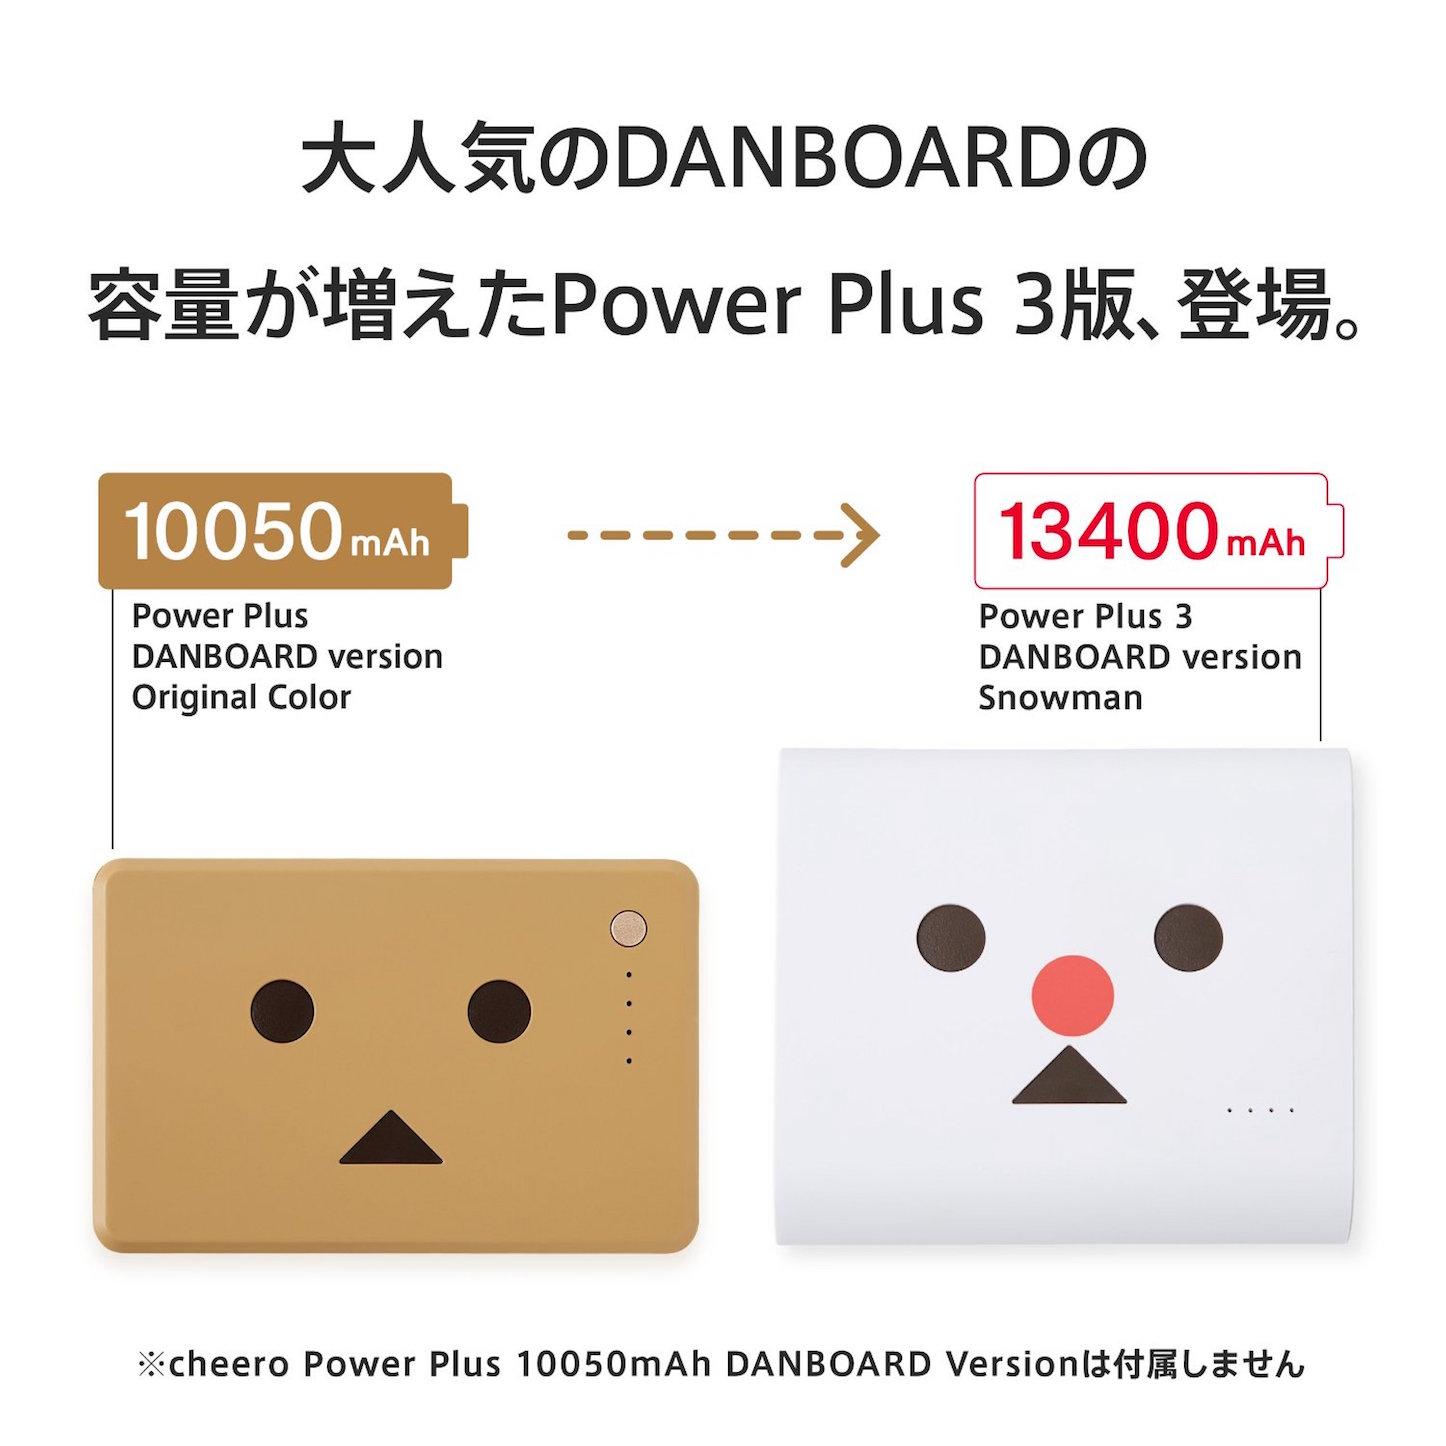 Cheero Power Plus 3 Danboard Version